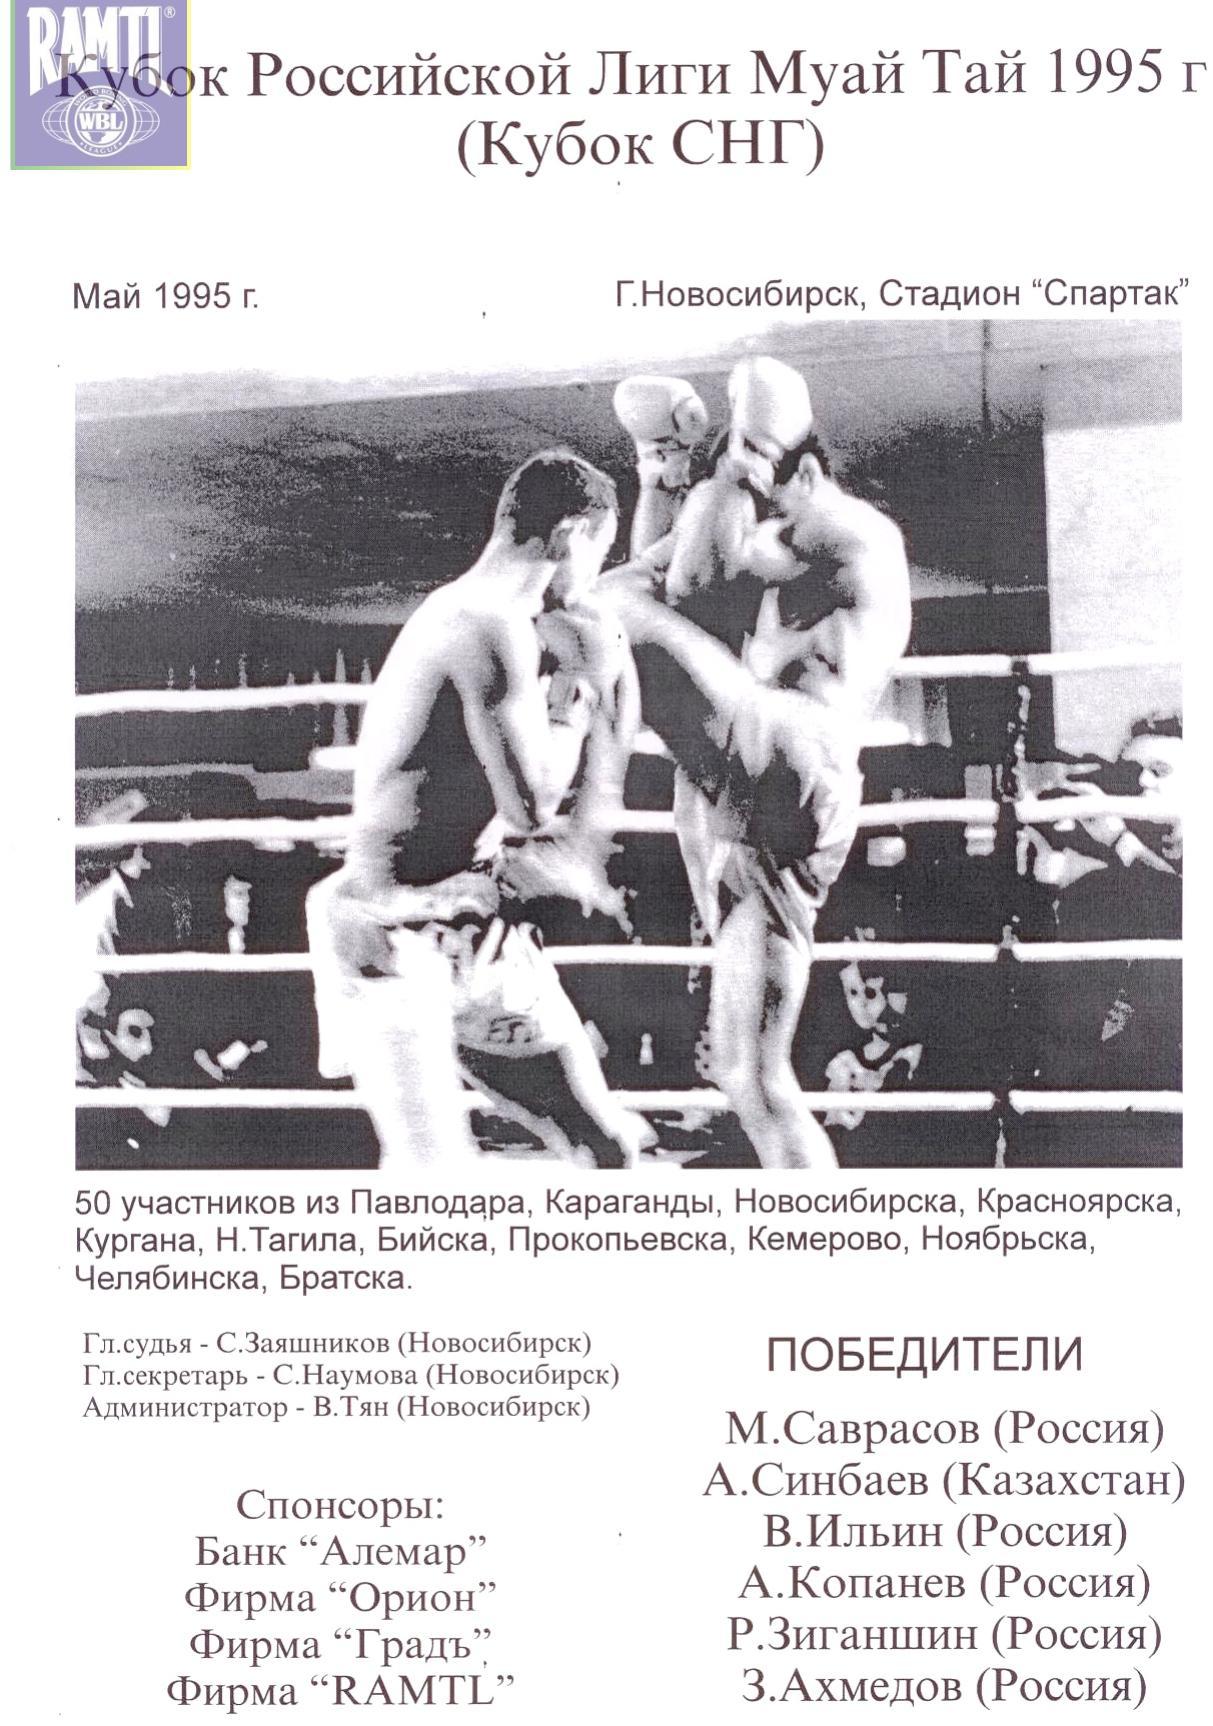 1995-05-04_Novosibirsk